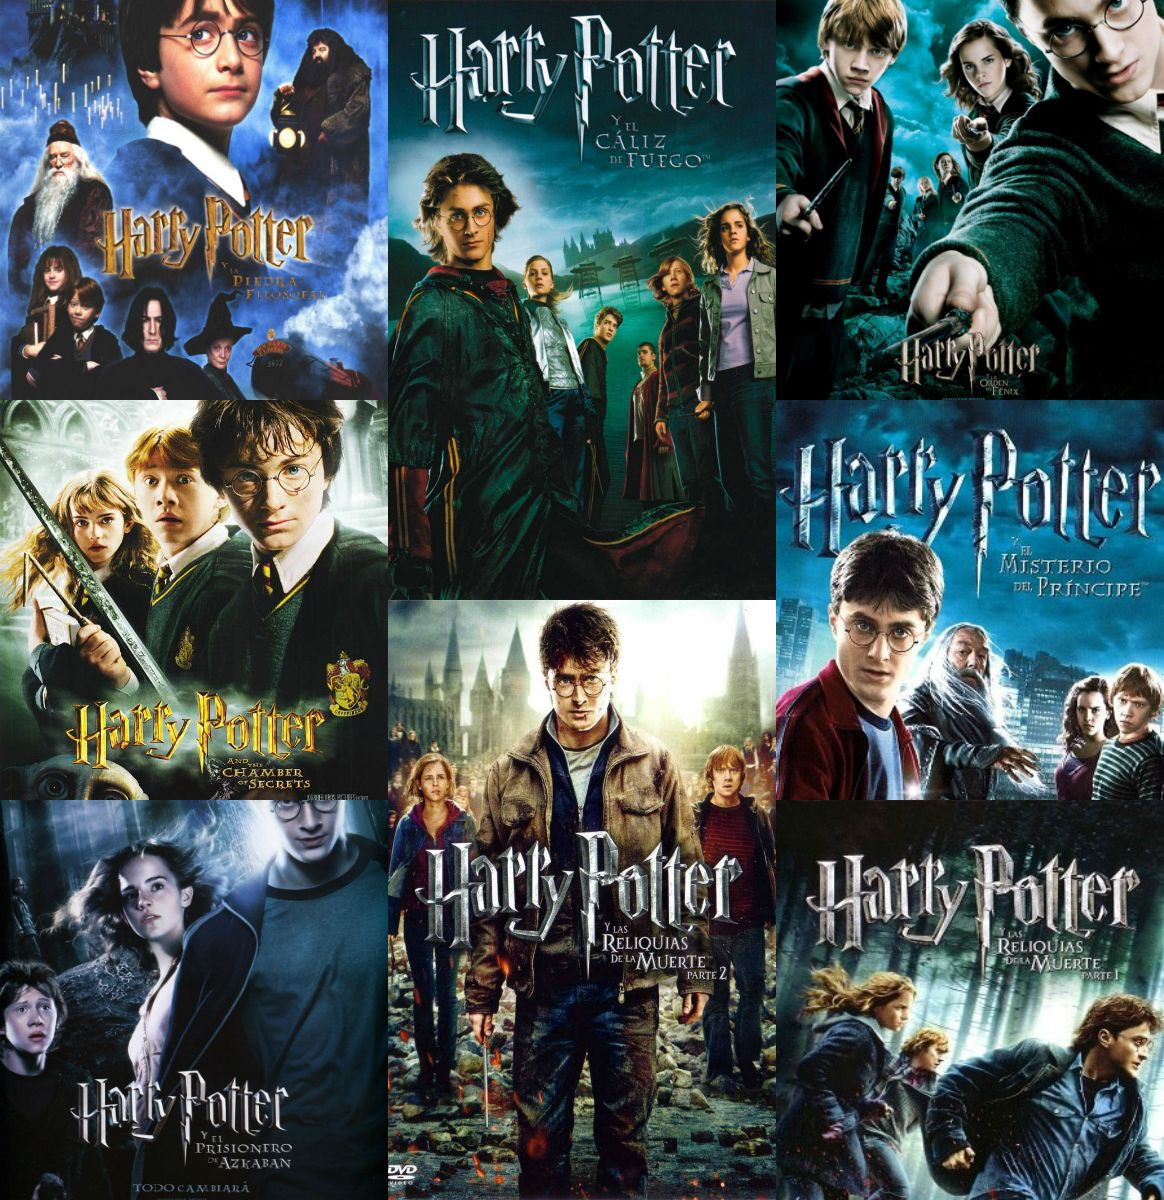 Freedescargascaw Pelicula Harry Potter Saga Completa Latino 1080p Mega 1 Link Harry Potter Movies Harry Potter Film Harry Potter Films